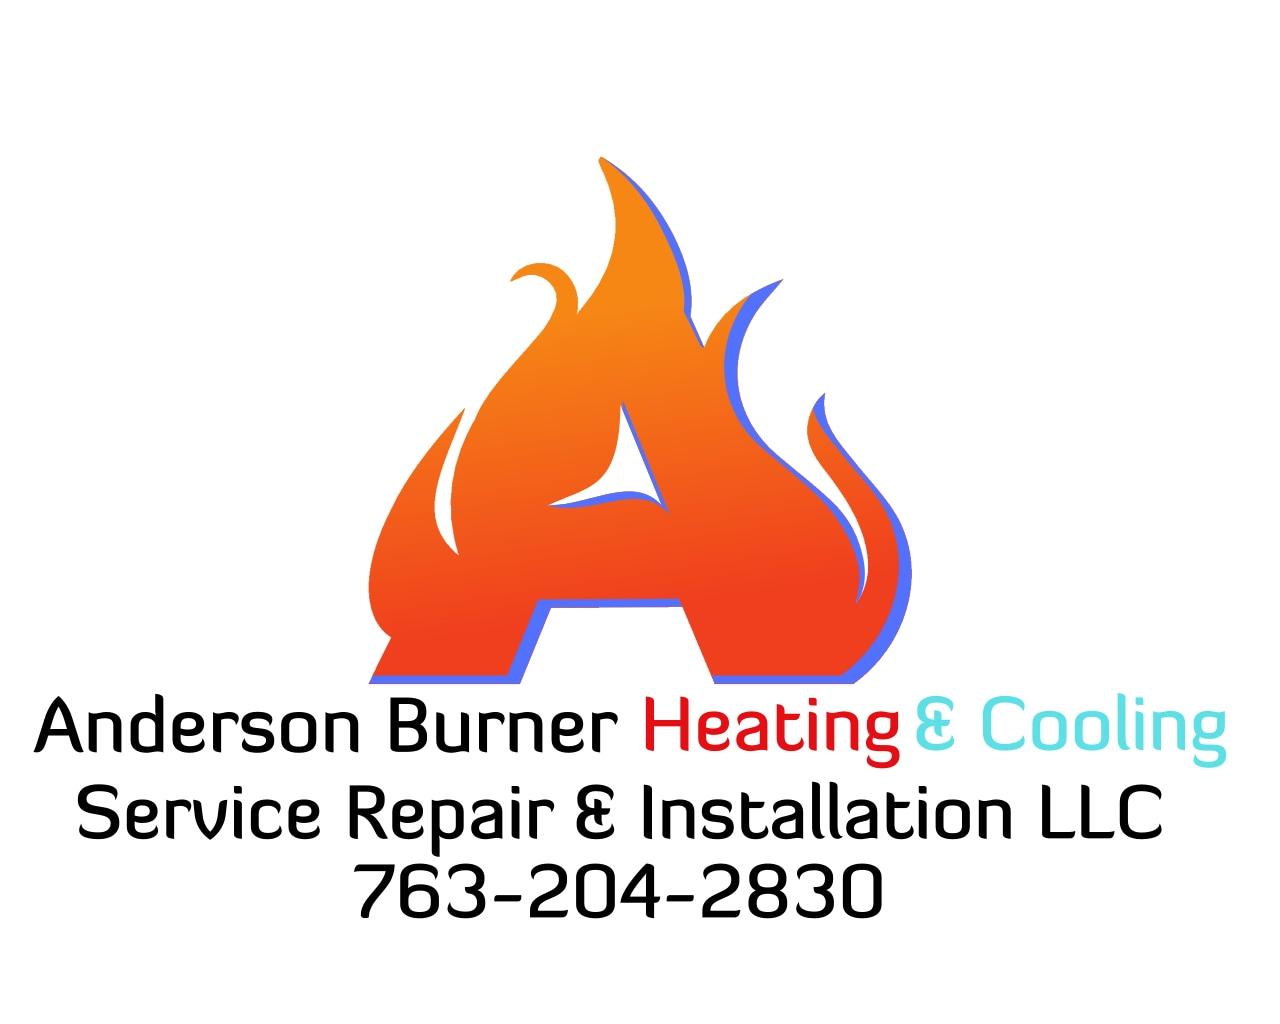 Anderson Burner Heating And Cooling LLC logo